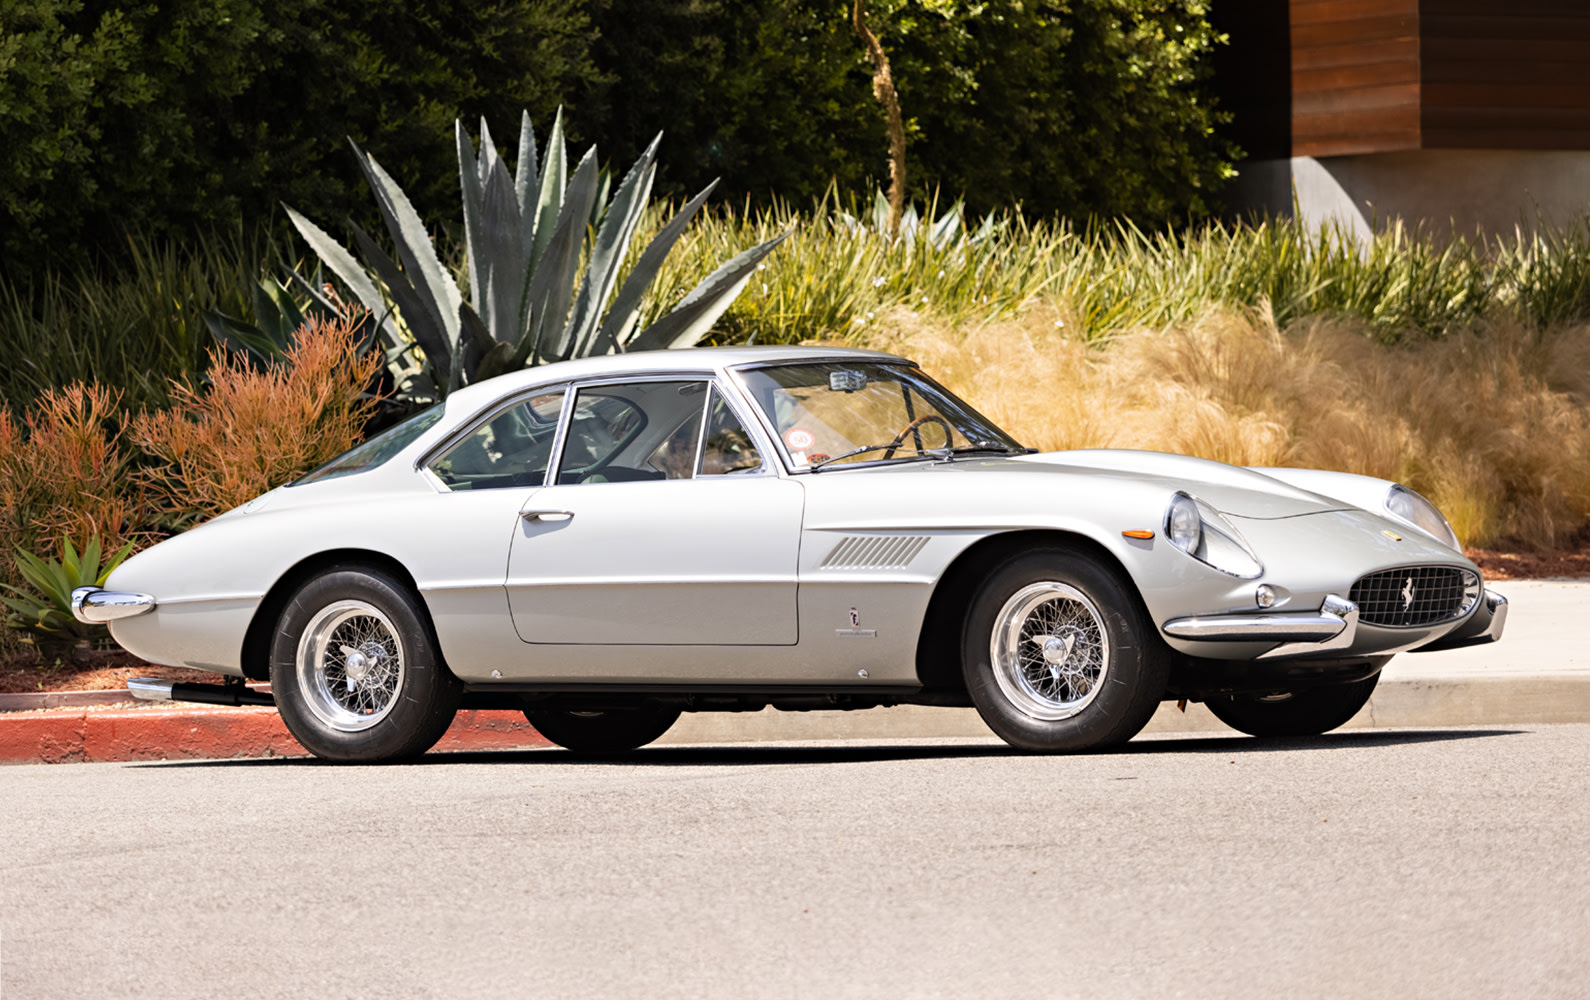 Prod/PB21 - Pebble Beach Auctions 2021/619 — 1962 Ferrari 400 Superamerica LWB Coupe Aerodinamico/1962_Ferrari_400_Superamerica_32_z5fy94